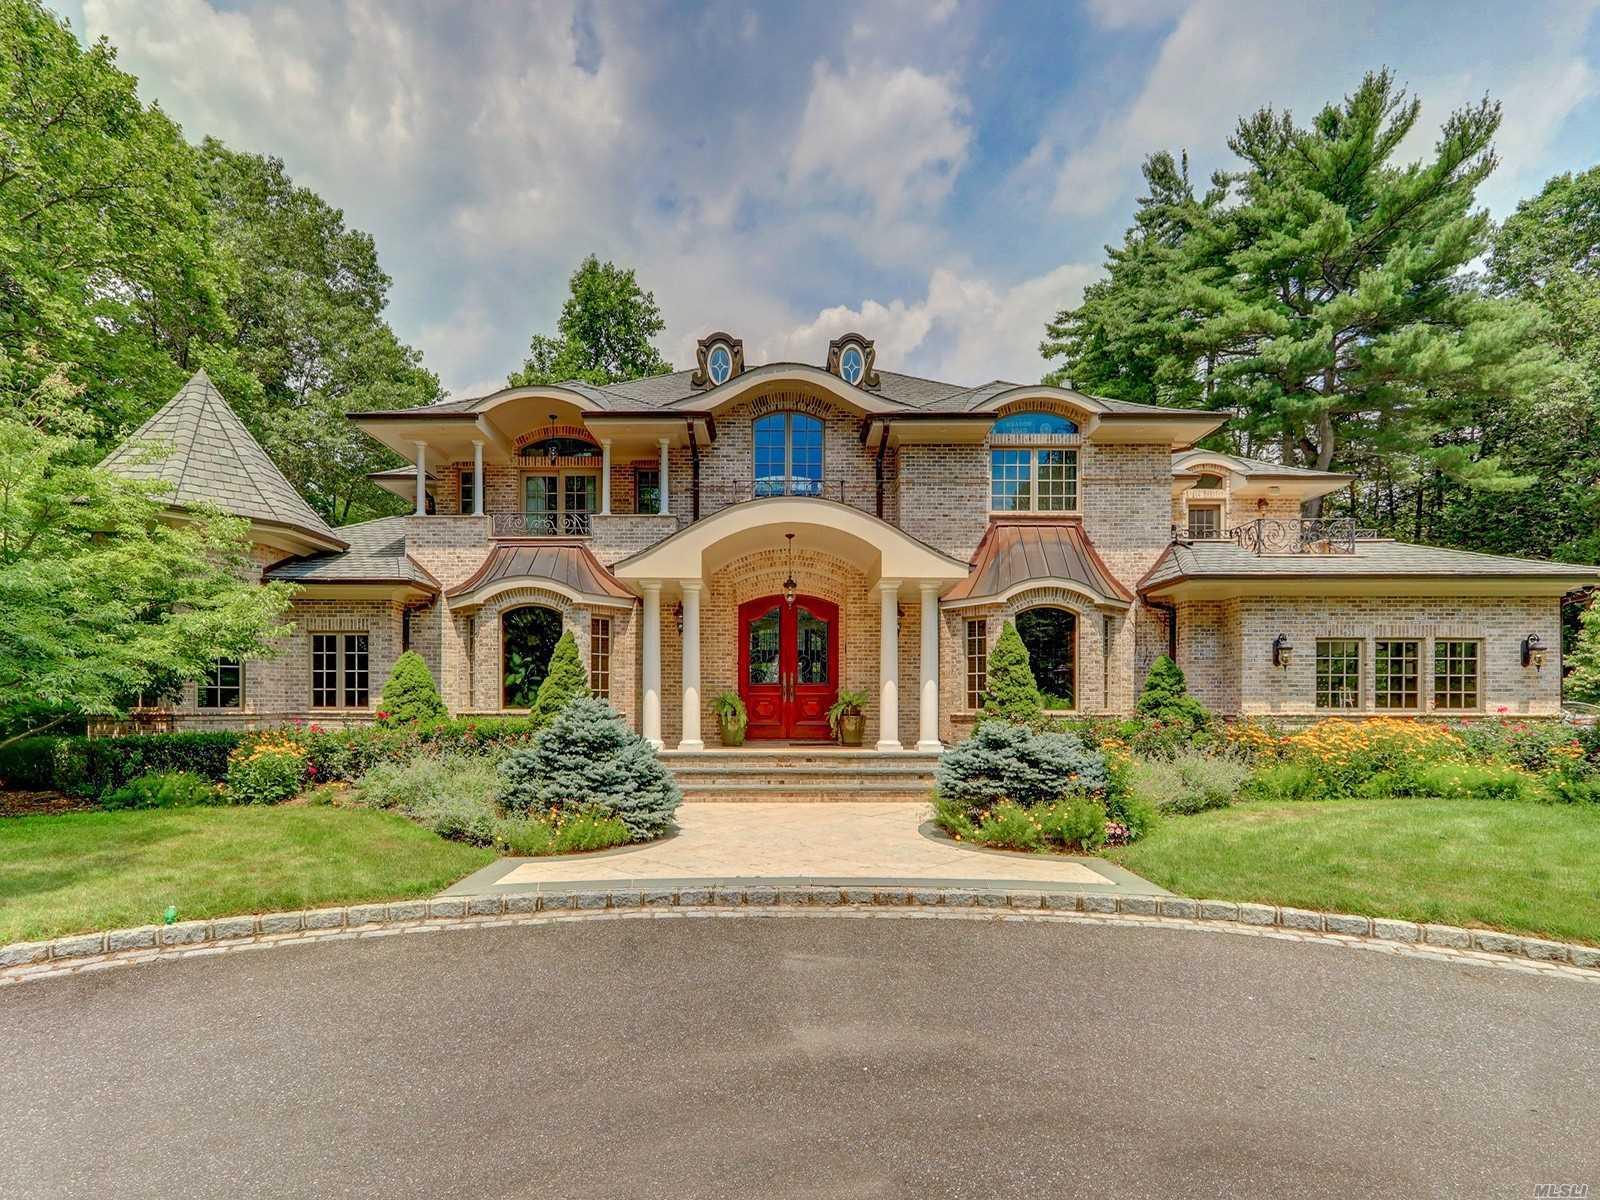 15 Meadow Road, Old Westbury, New York 11568, 5 Bedrooms Bedrooms, ,5 BathroomsBathrooms,Residential,For Sale,Meadow,3149071